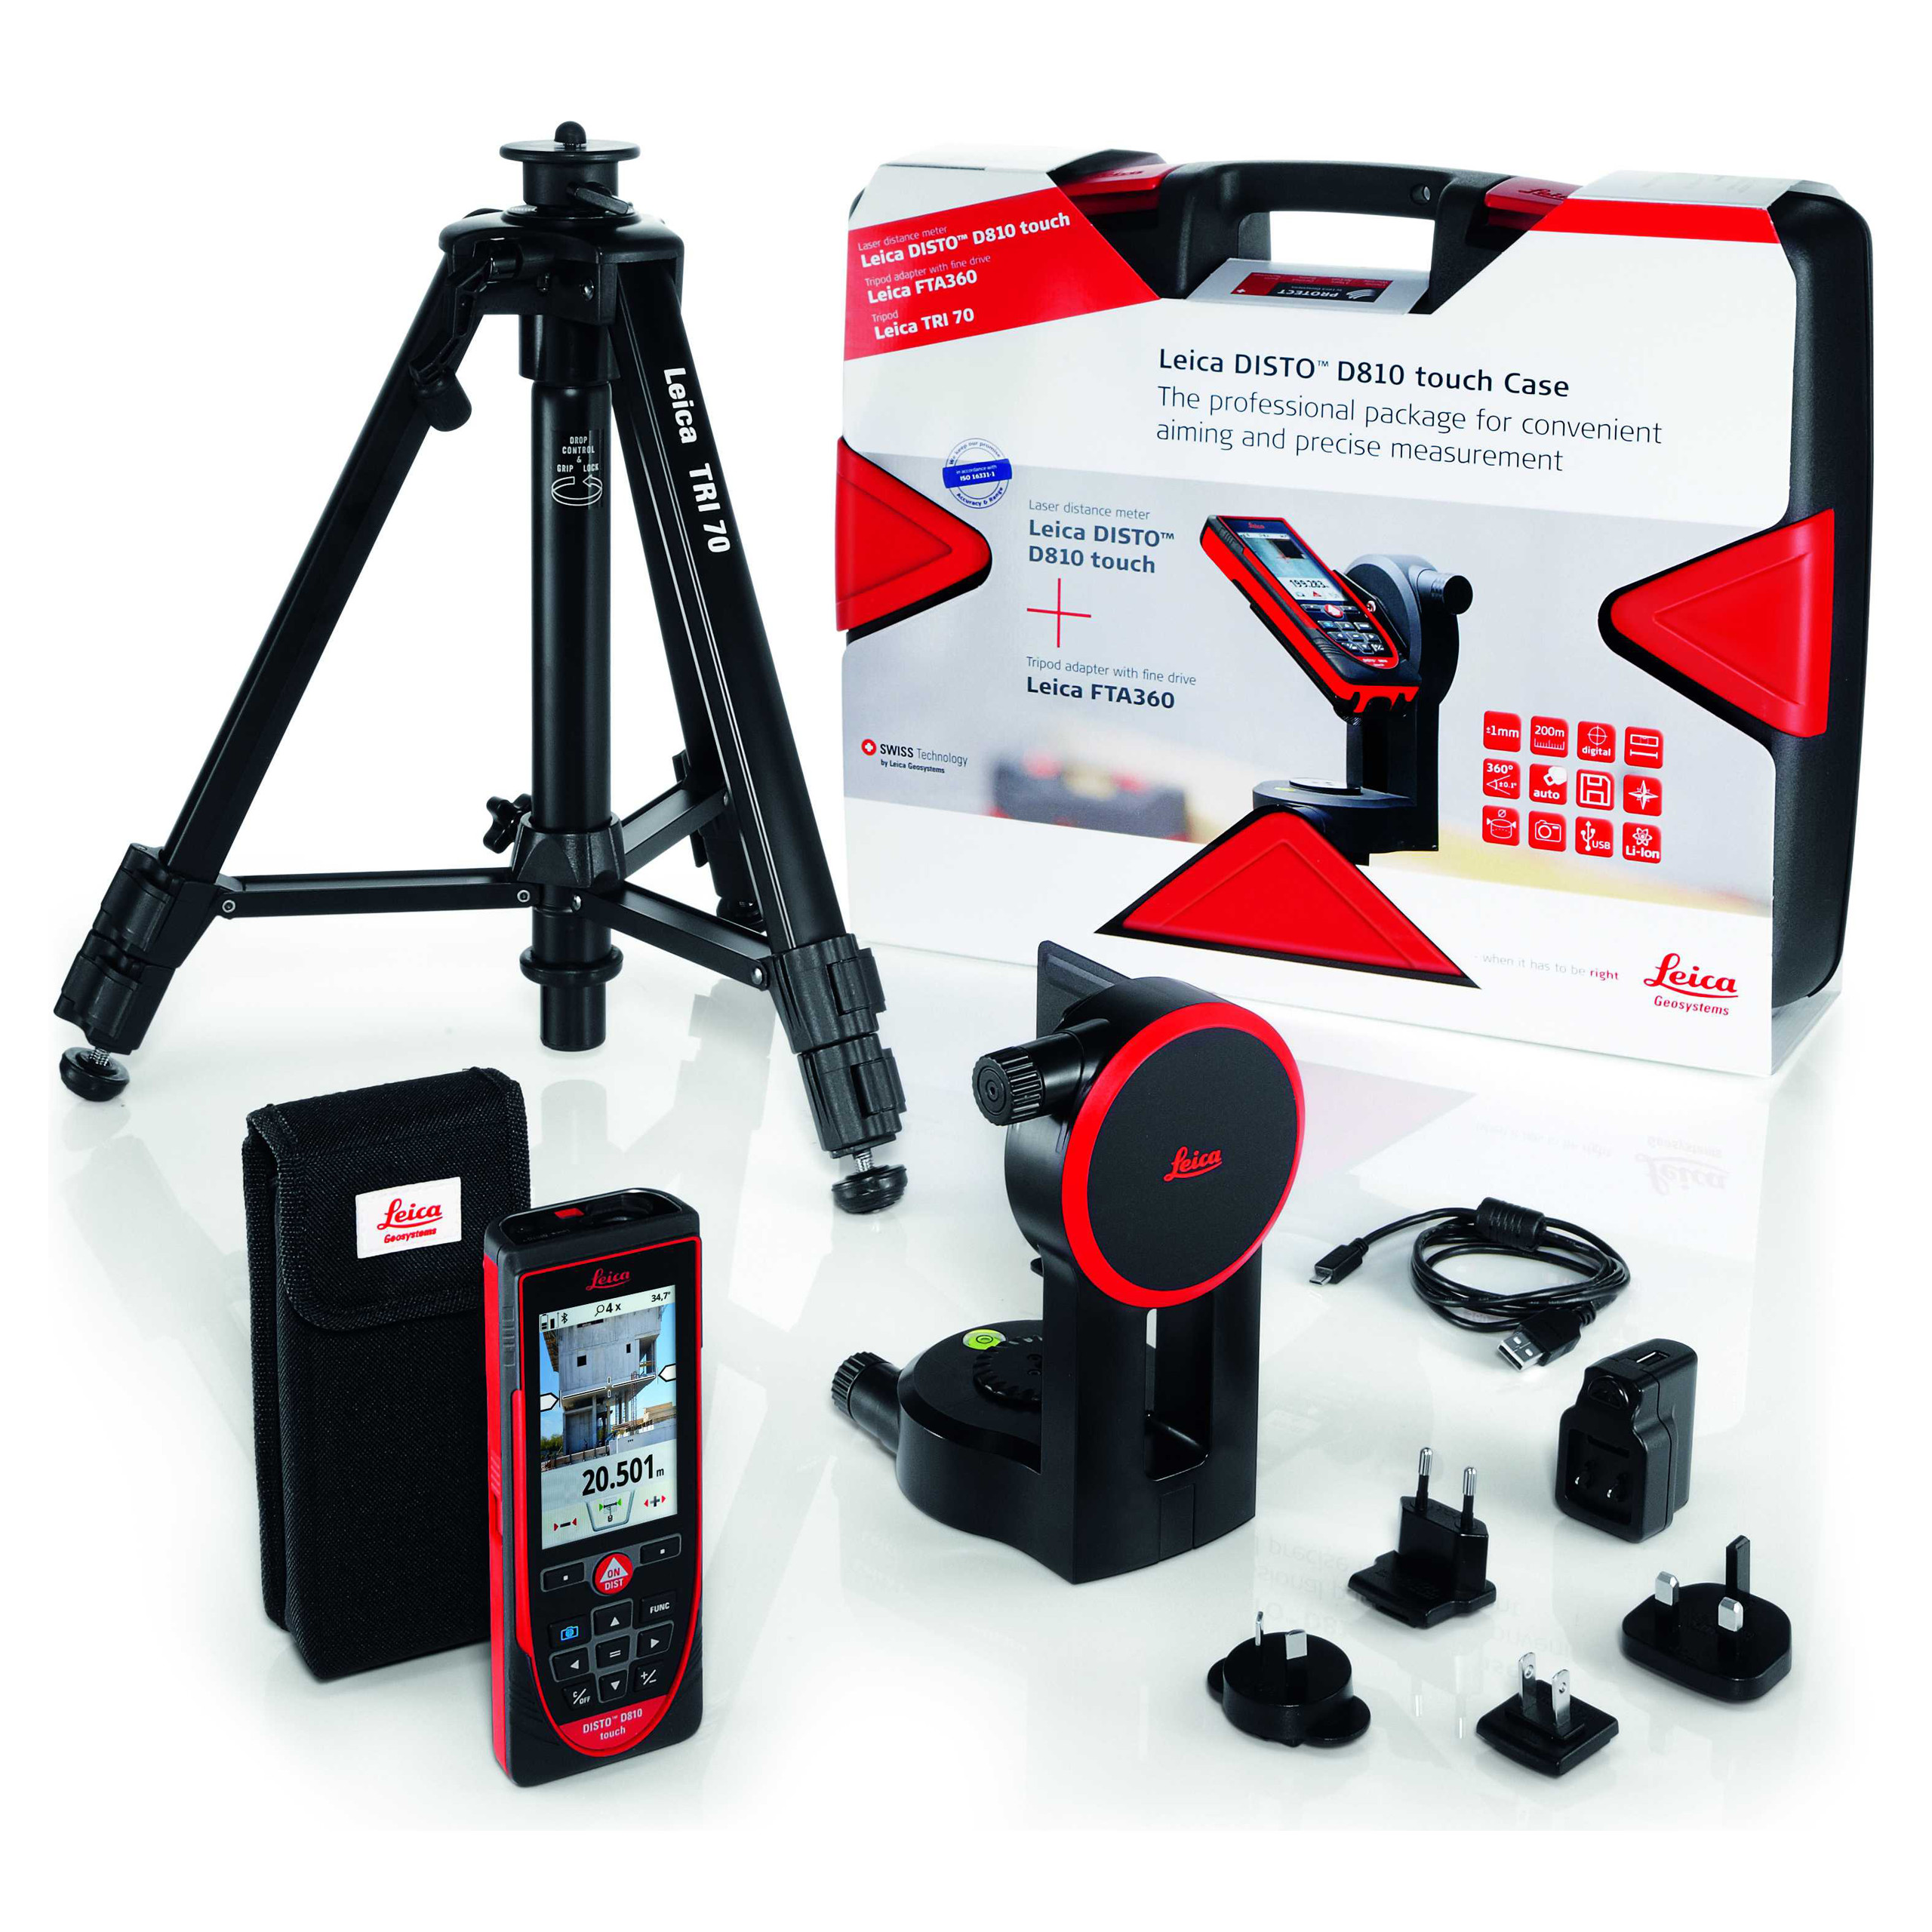 Leicica Disto D810 Laser D810 - SPACK